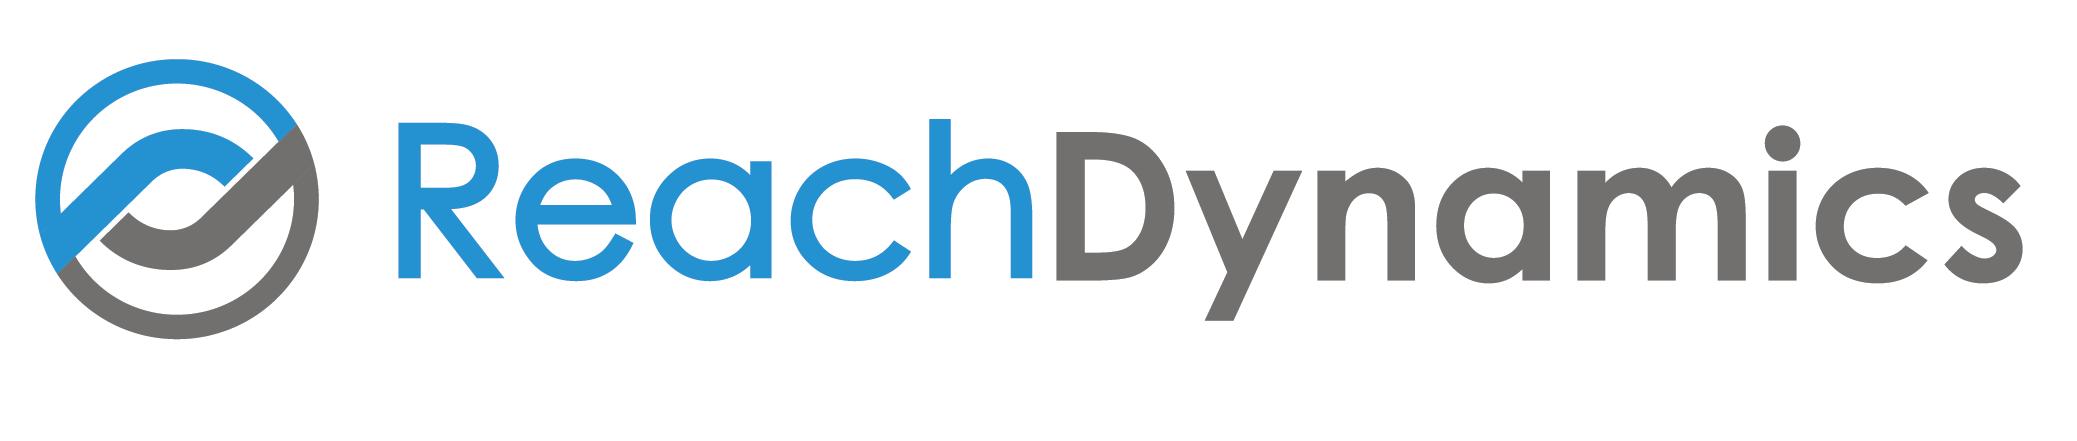 reachdynamics Logo